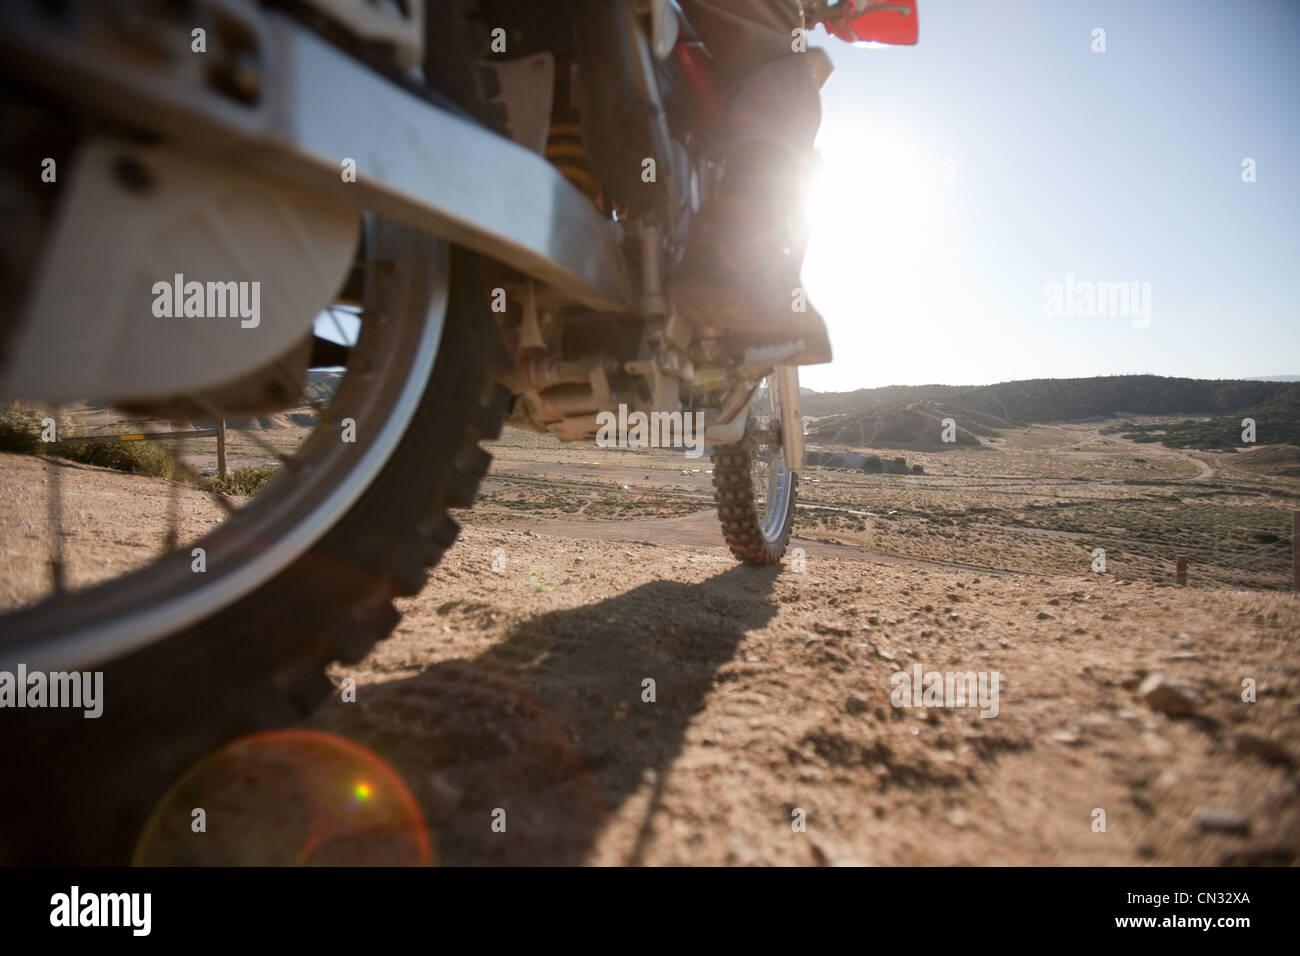 Low angle of dirt bike - Stock Image